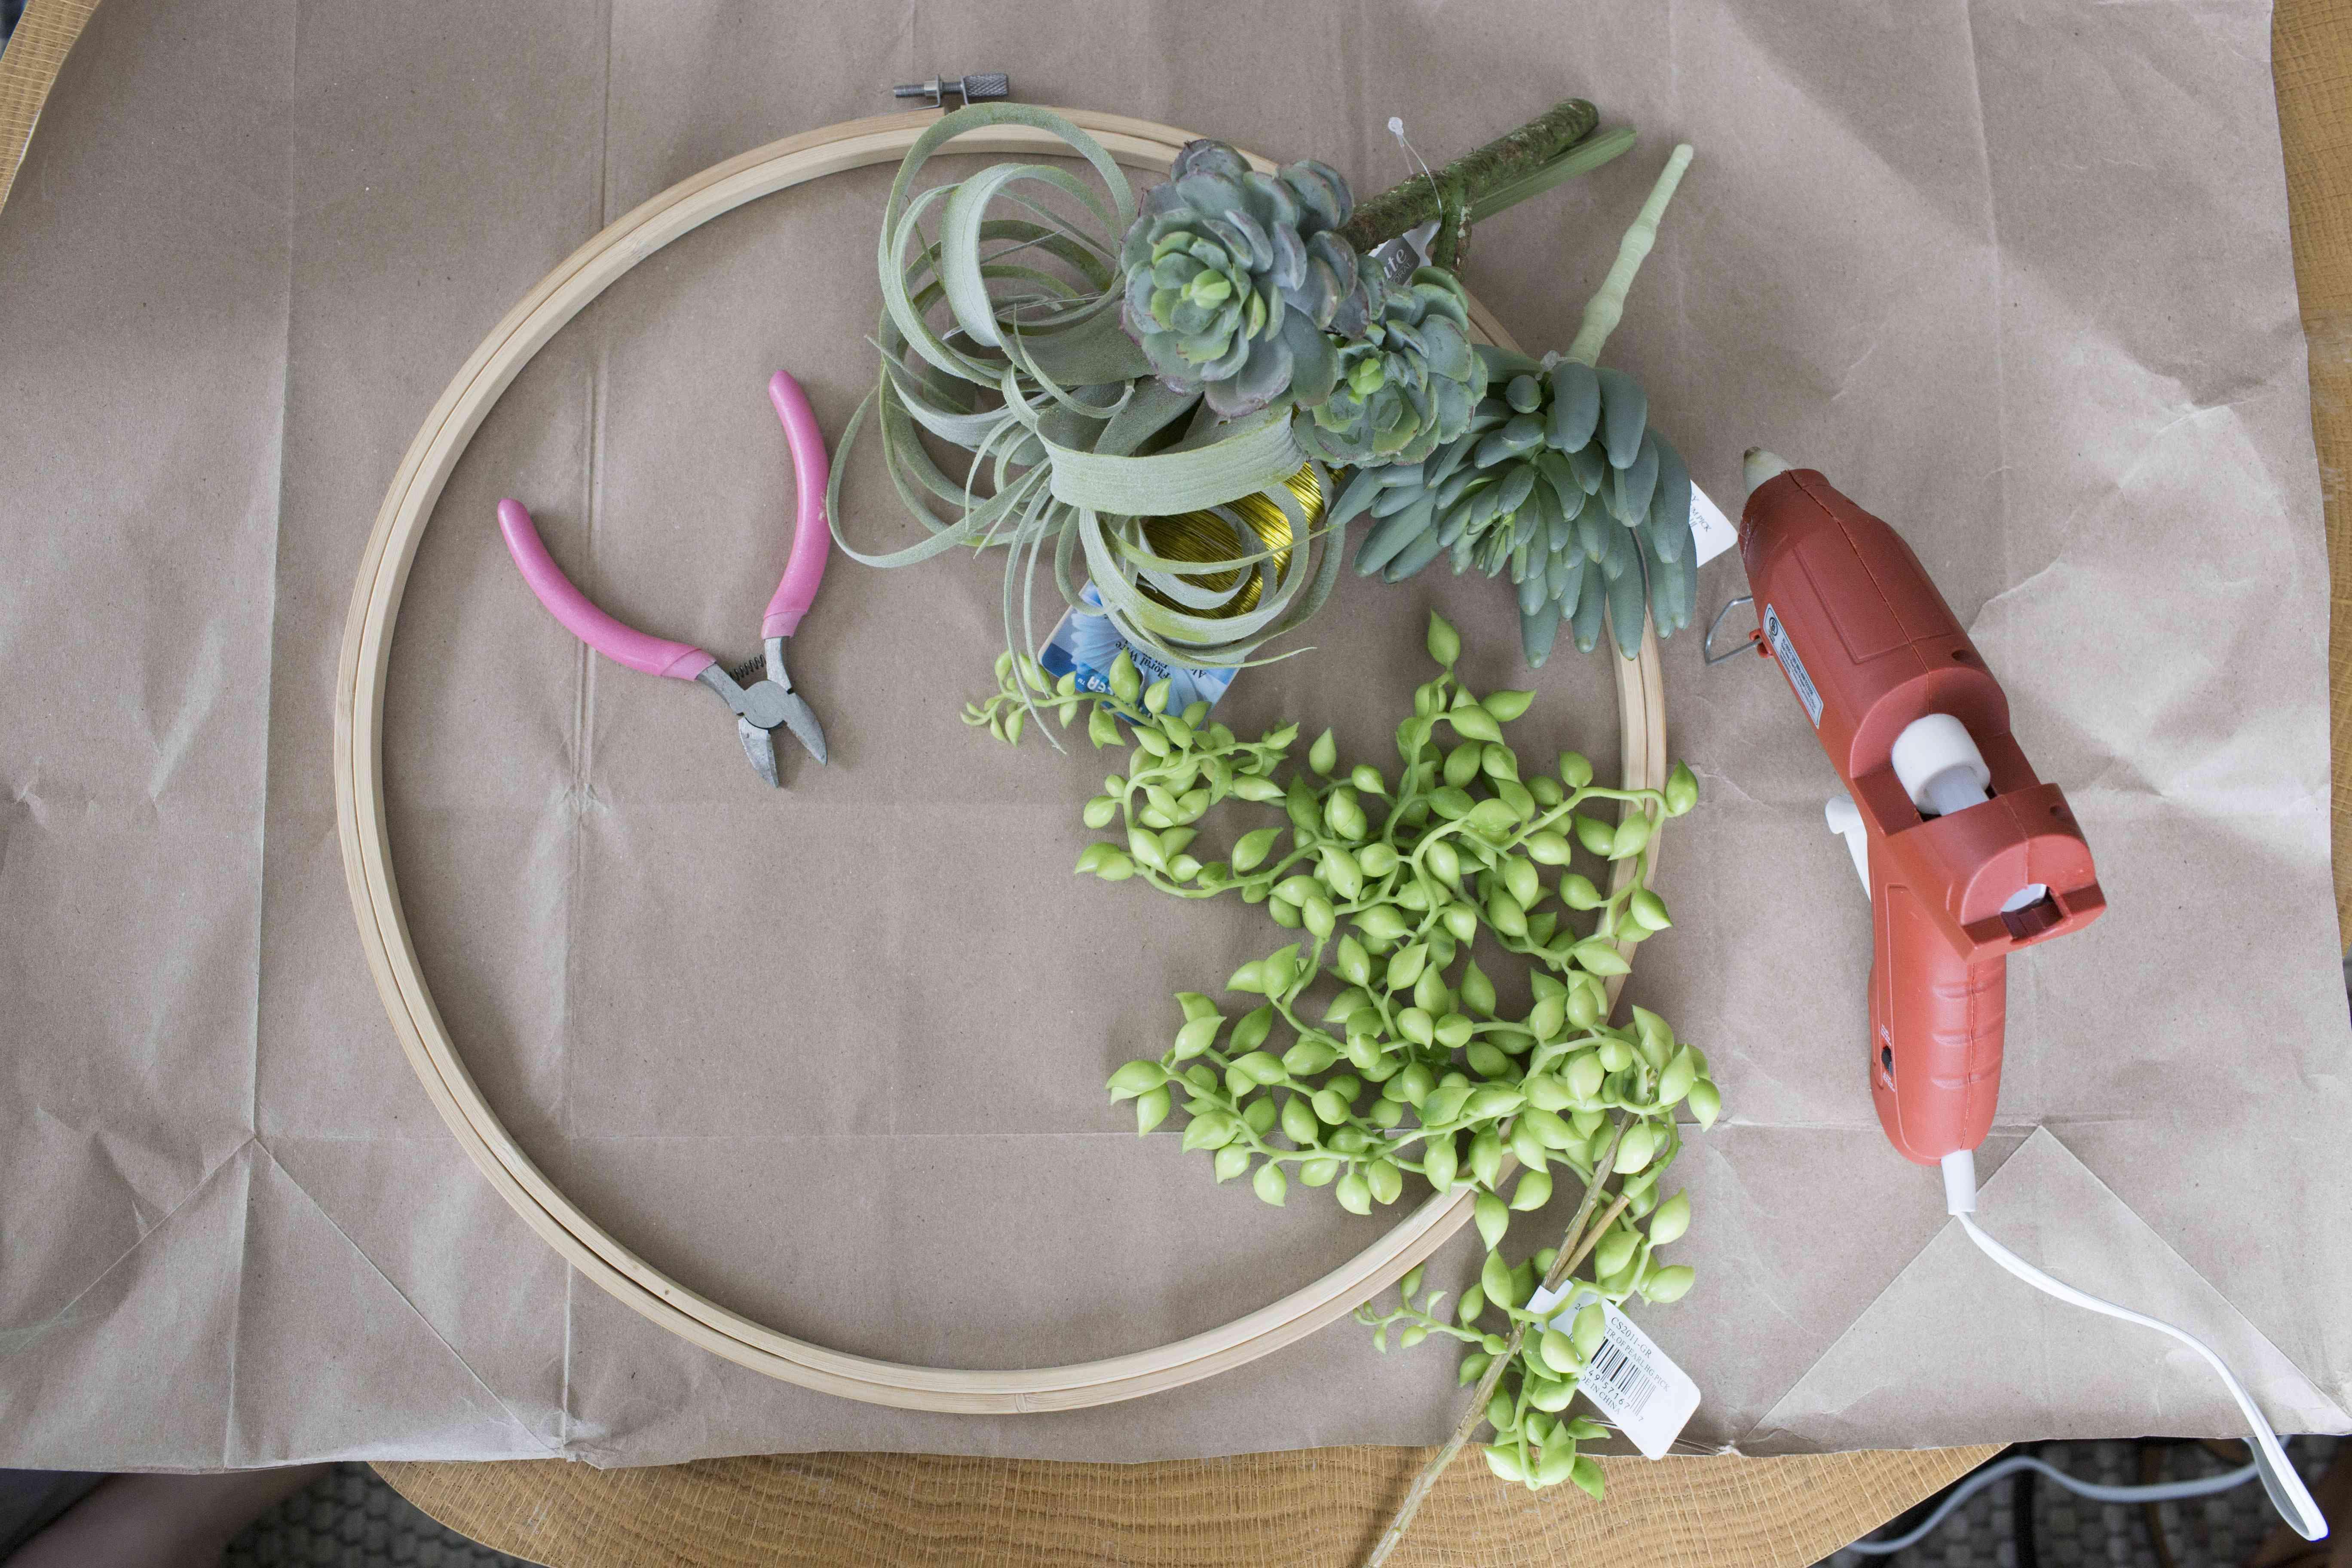 Supplies for a faux succulent wreath